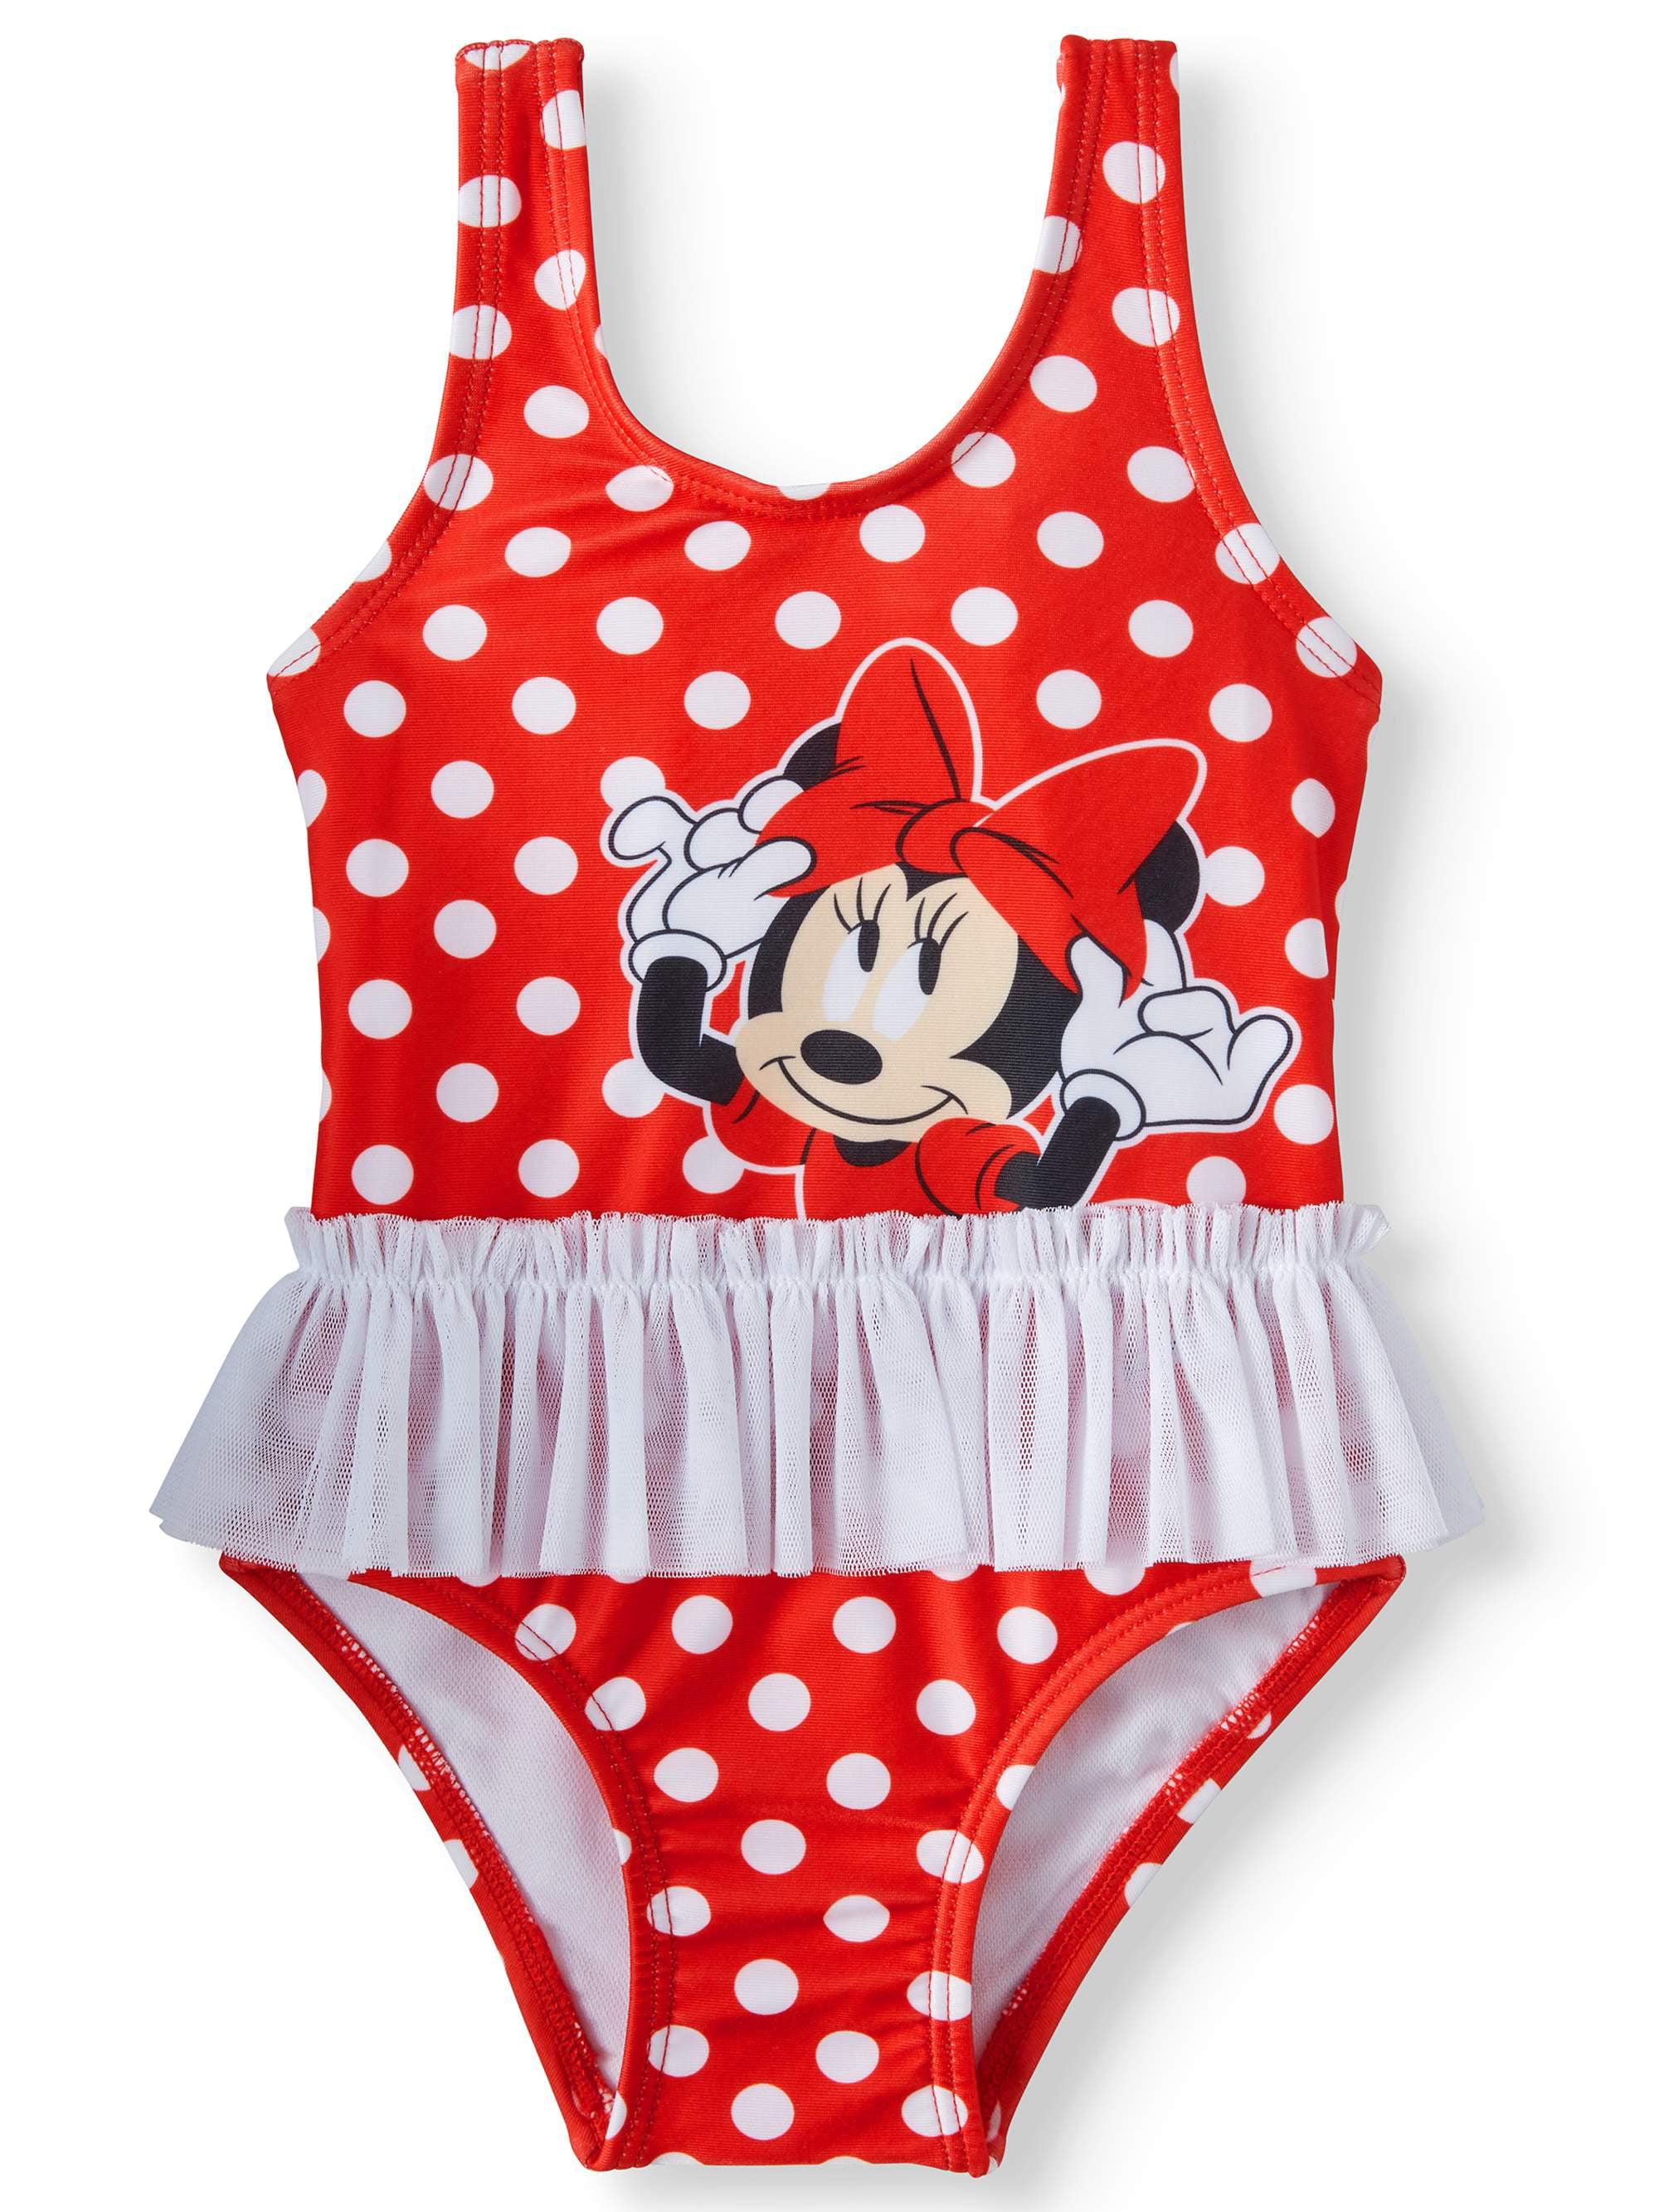 ed23b5d776 Minnie Mouse - Baby Girls' Minnie Mouse Polka Dot Tutu One Piece Swimsuit -  Walmart.com